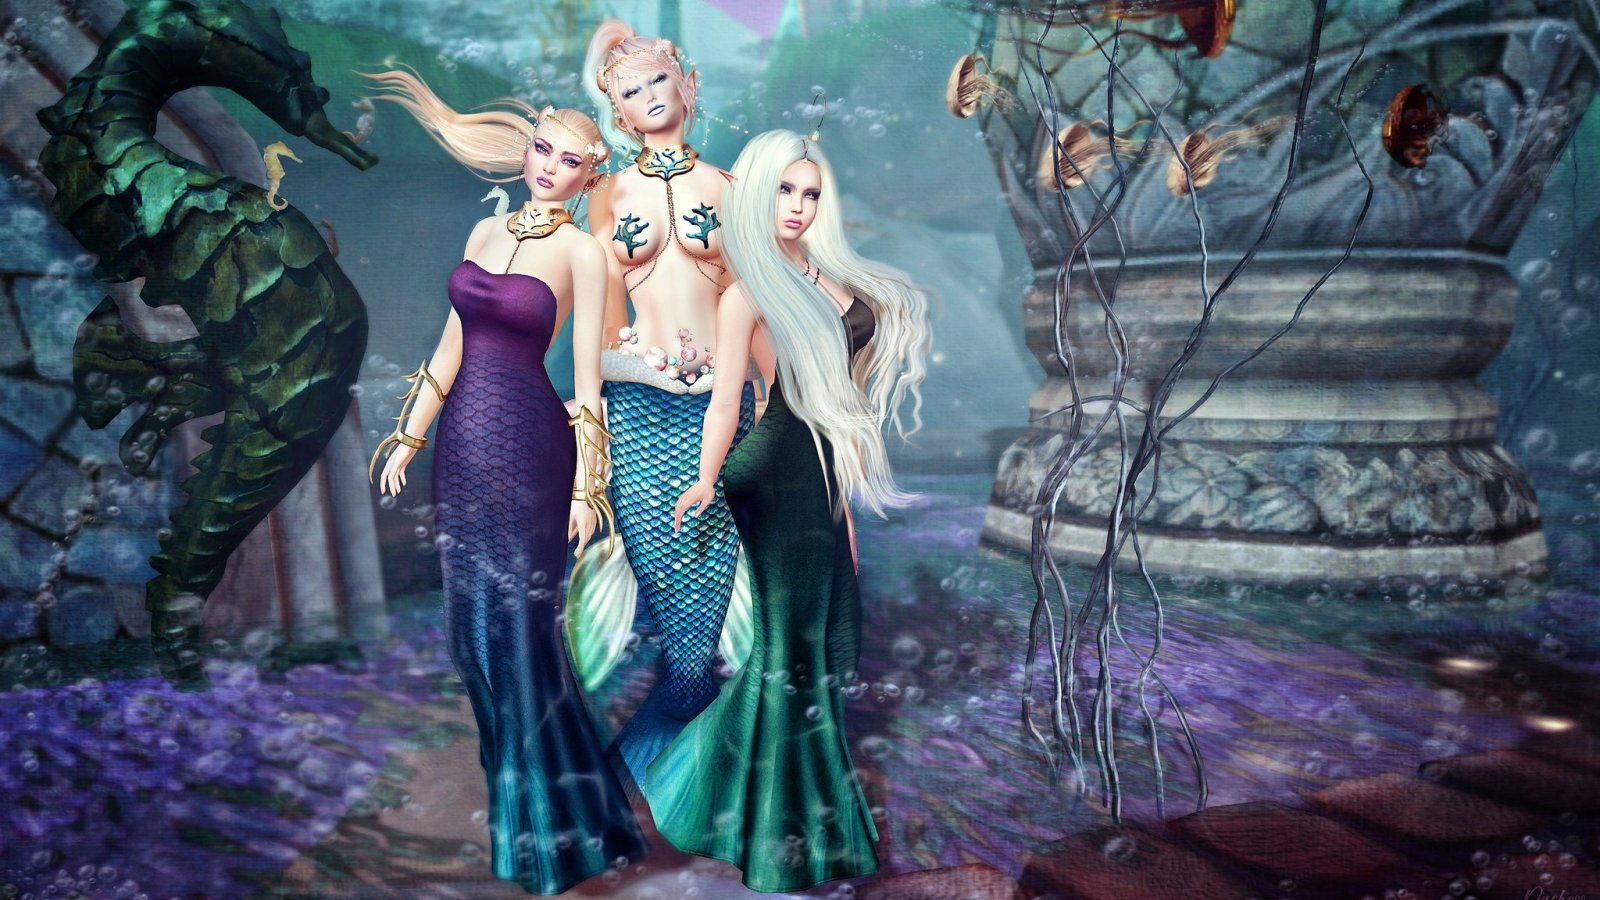 The Mermaid Menage